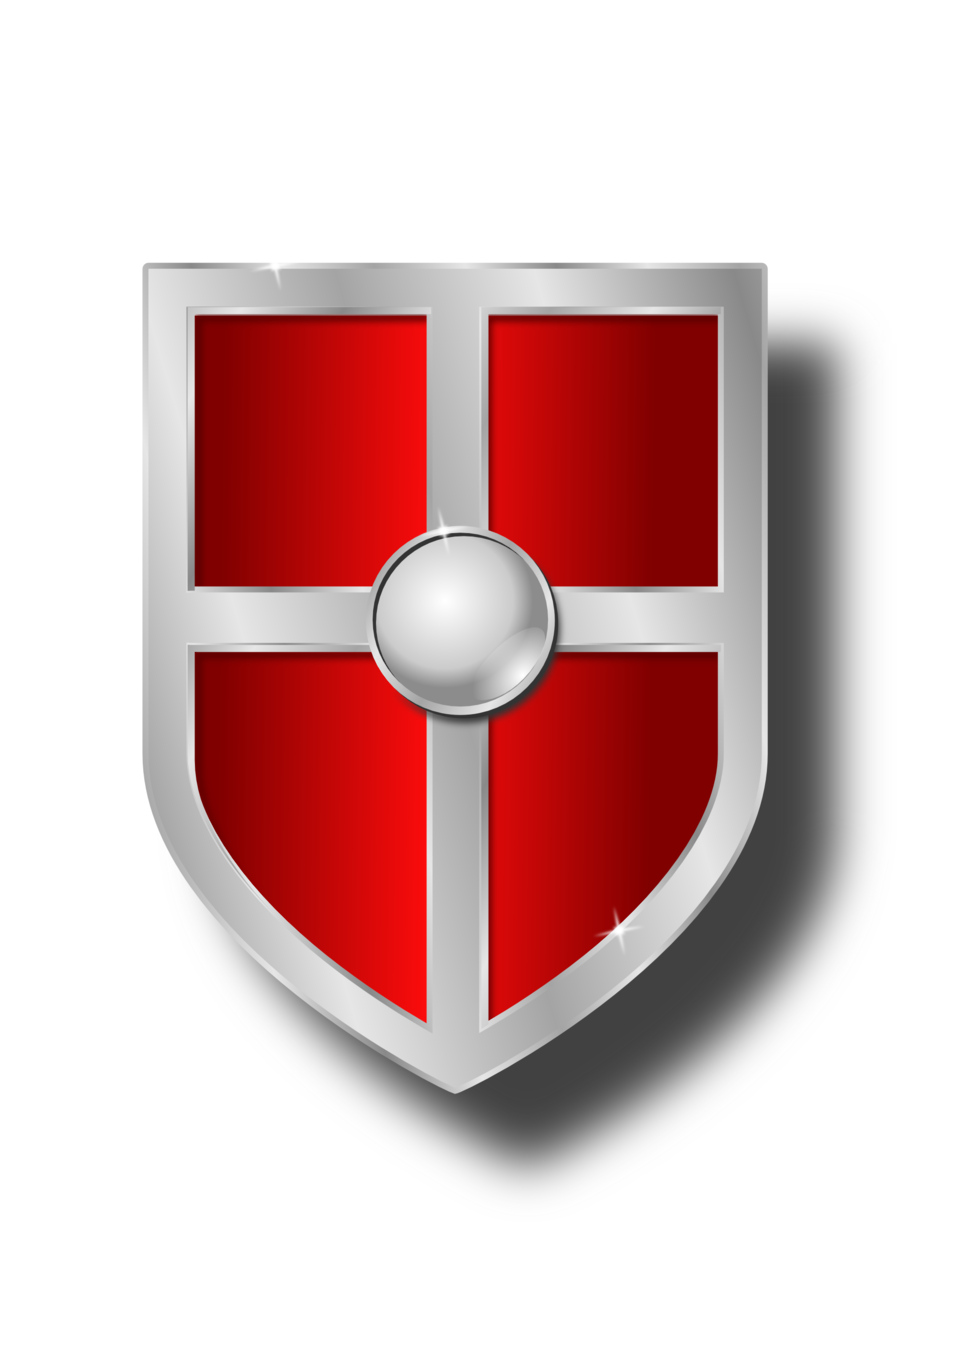 weapon shield